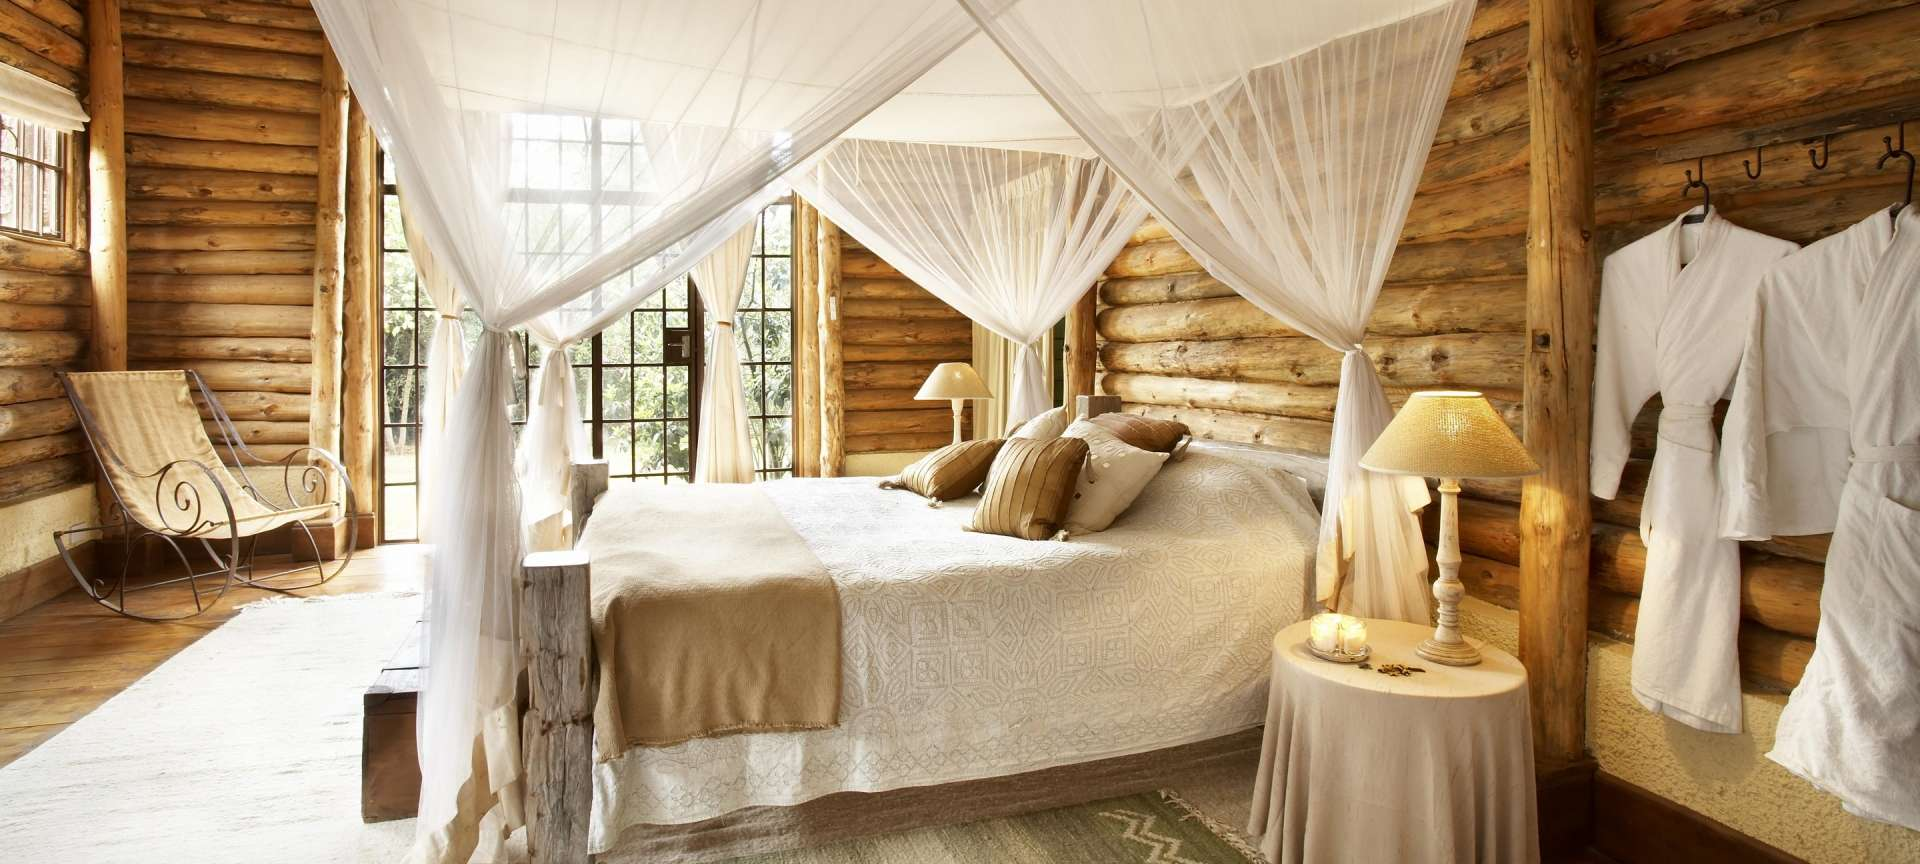 Балдахин своими руками в деревянном доме